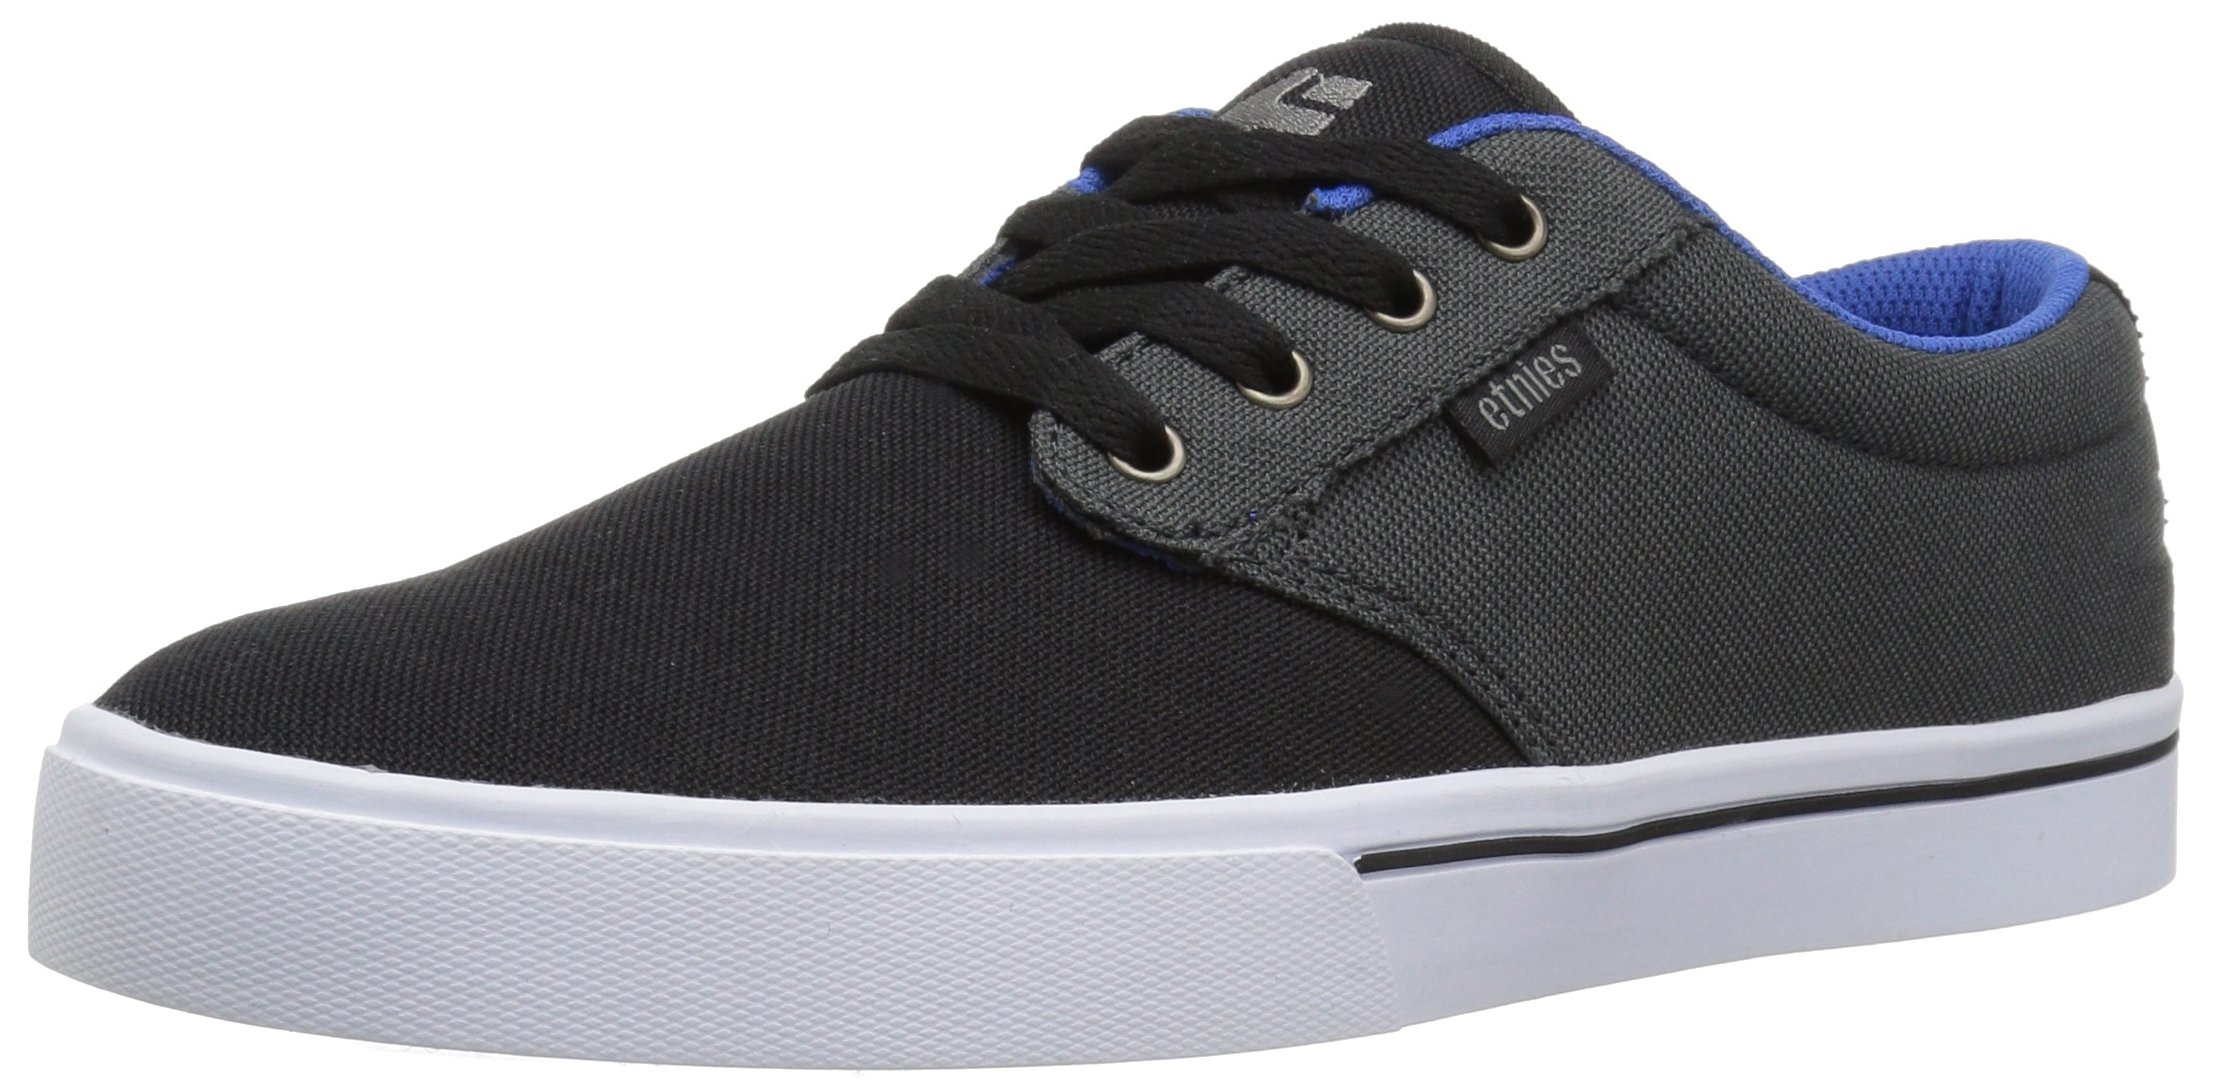 5994d066df34 Galleon - Etnies Mens Men s Jameson 2 Eco Skate Shoe